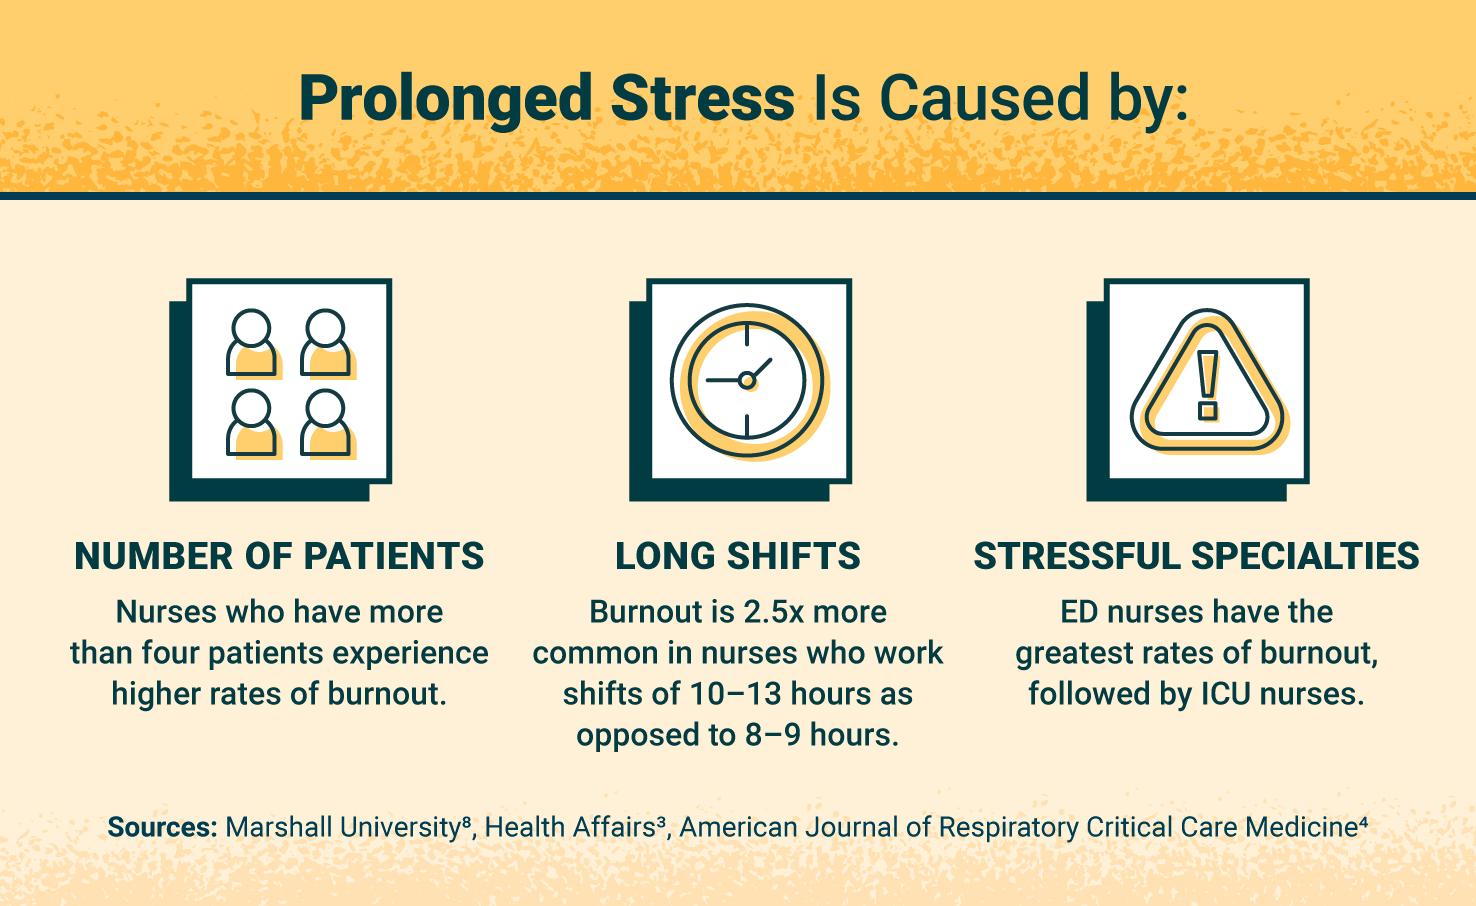 three causes of prolonged stress